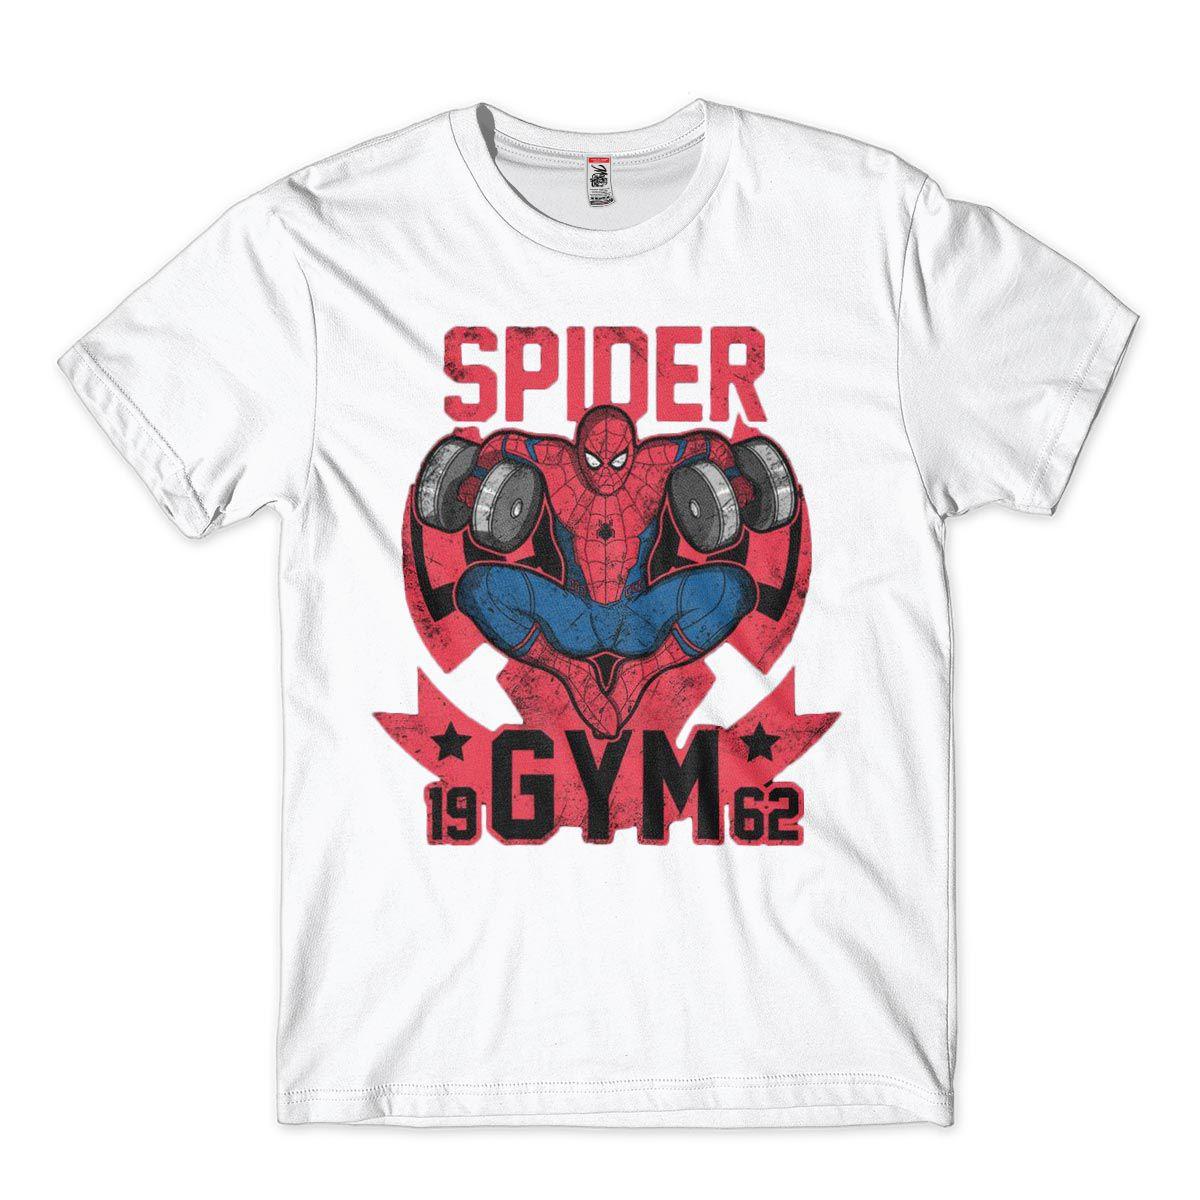 Roupa de Academia Spider Gym Camisa Masculina